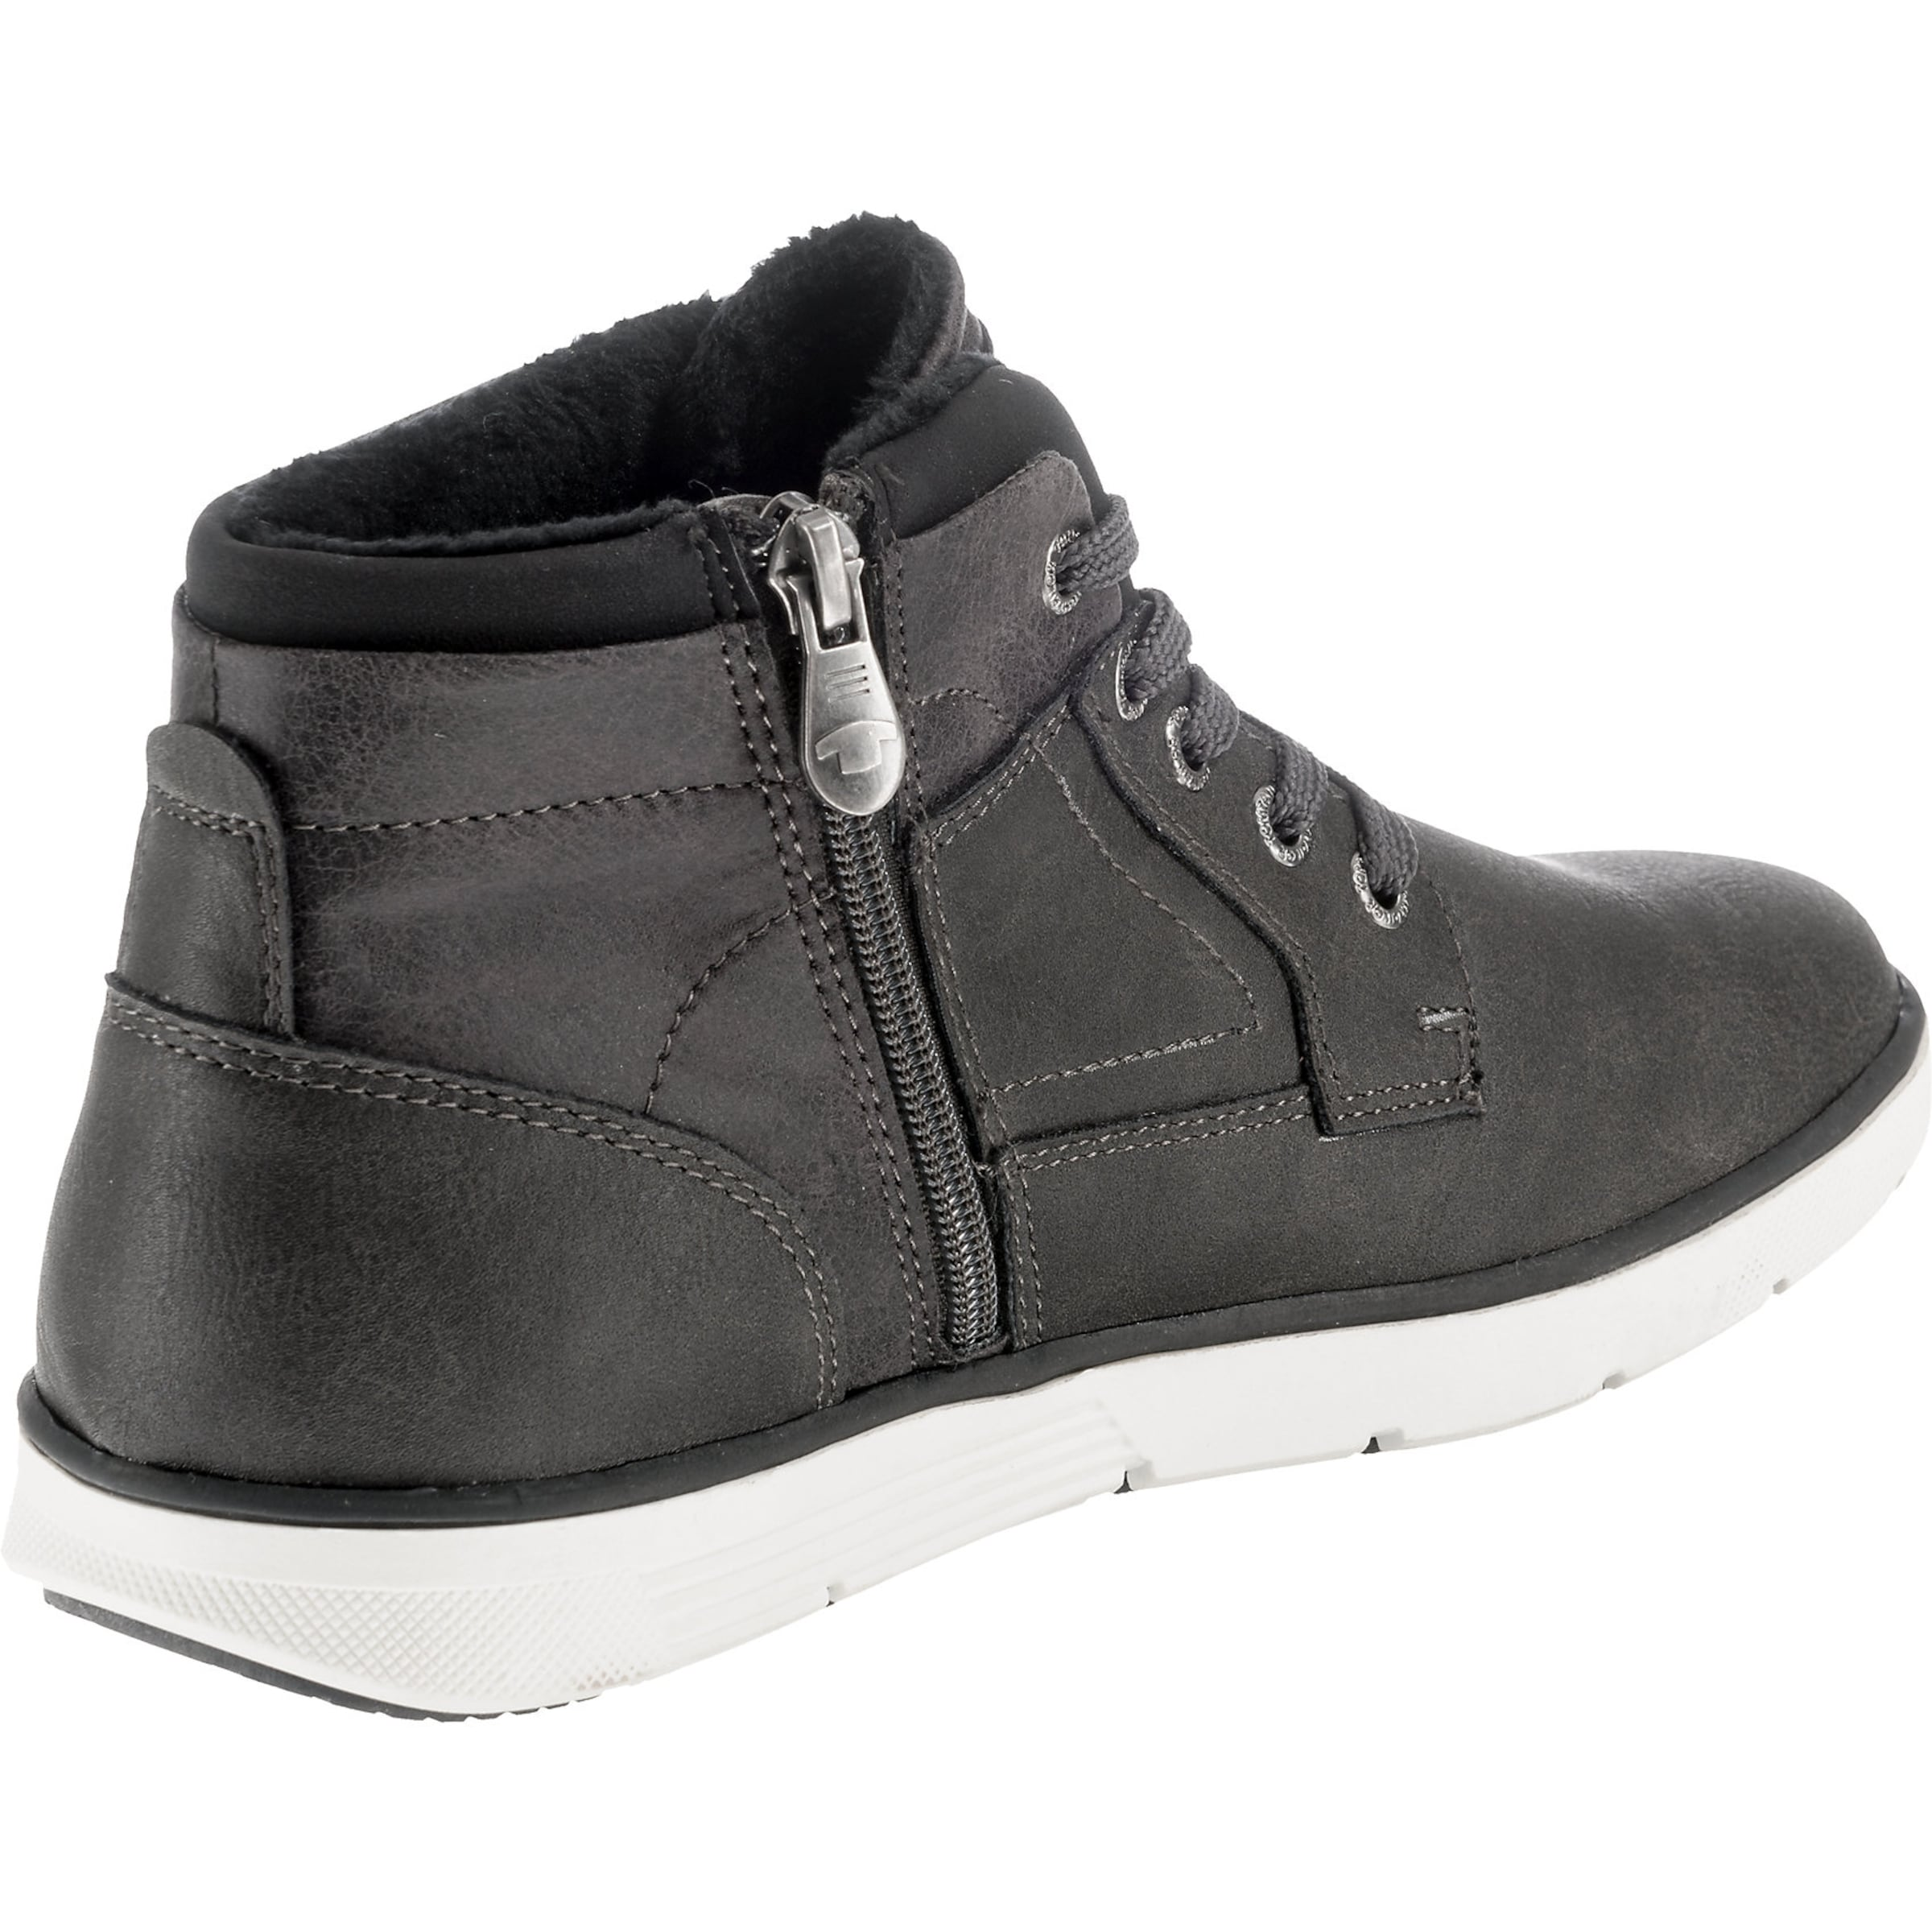 Sneakers DunkelgrauWeiß Tom In High Tailor q4ALj35R